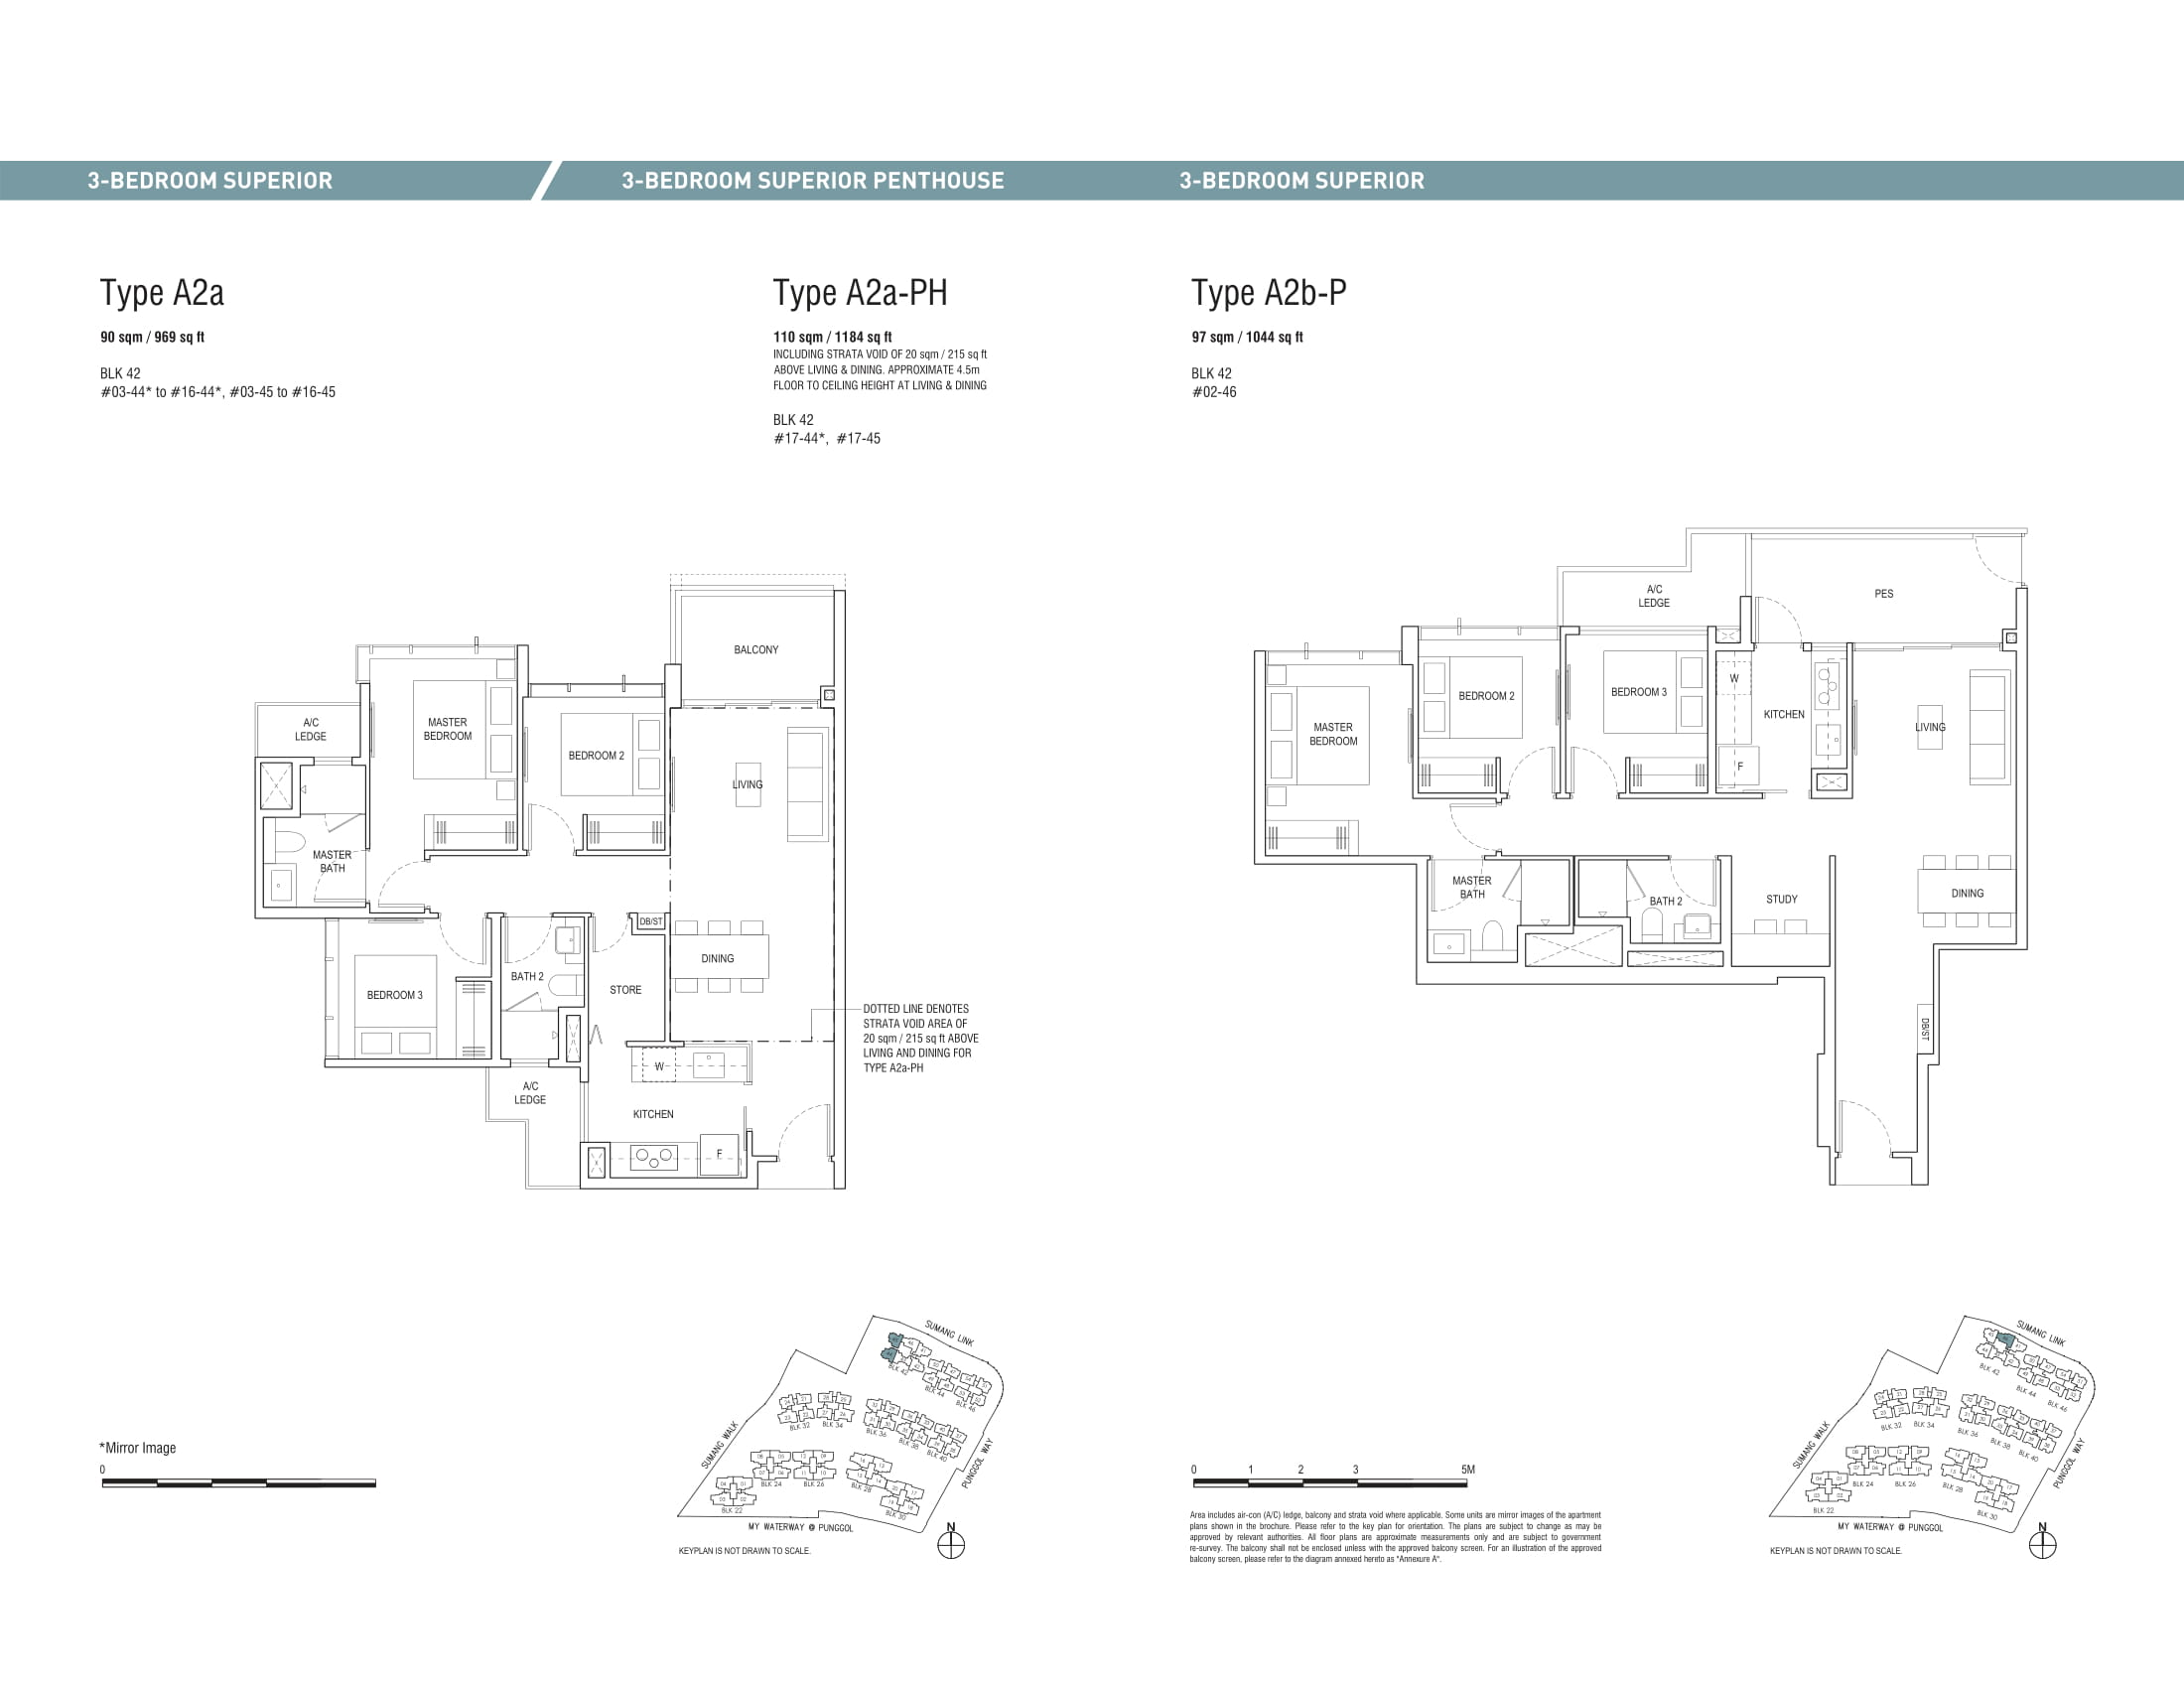 Piermont Grand EC's three-bedroom superior and three-bedroom superior penthouse types